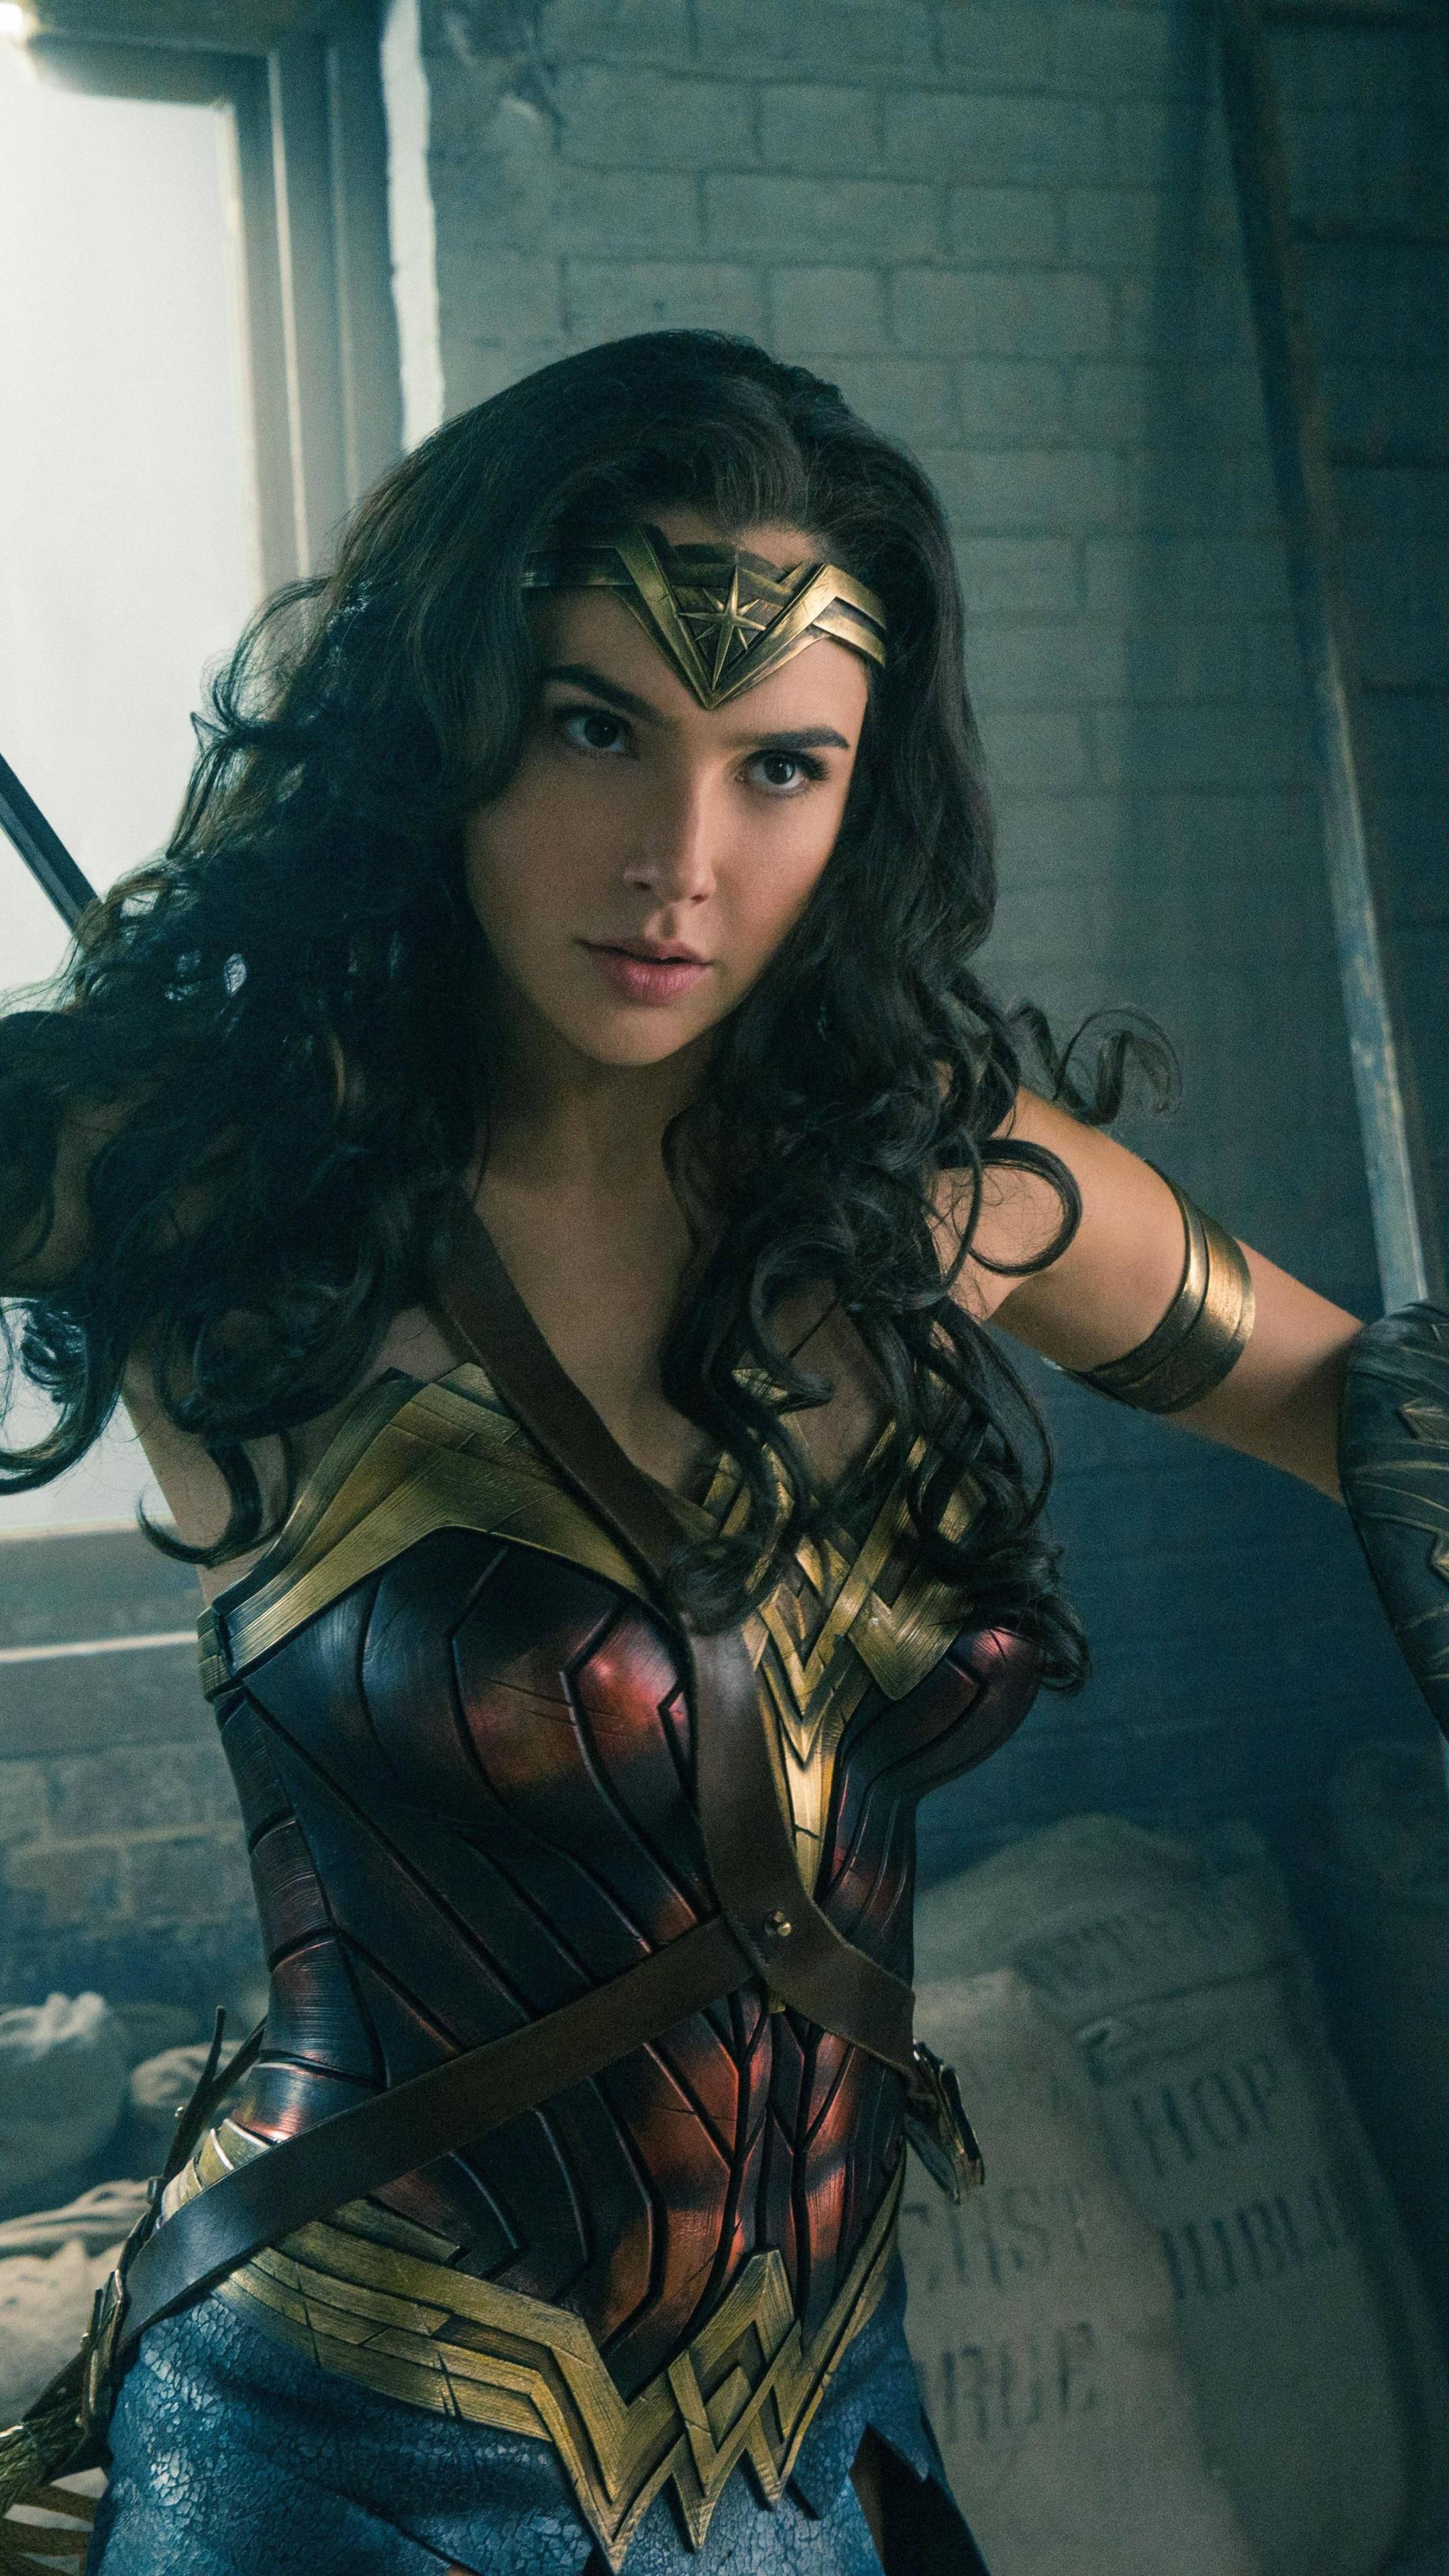 Wallpaper Wonder Woman 4k 5k Gal Gadot Movies 11684